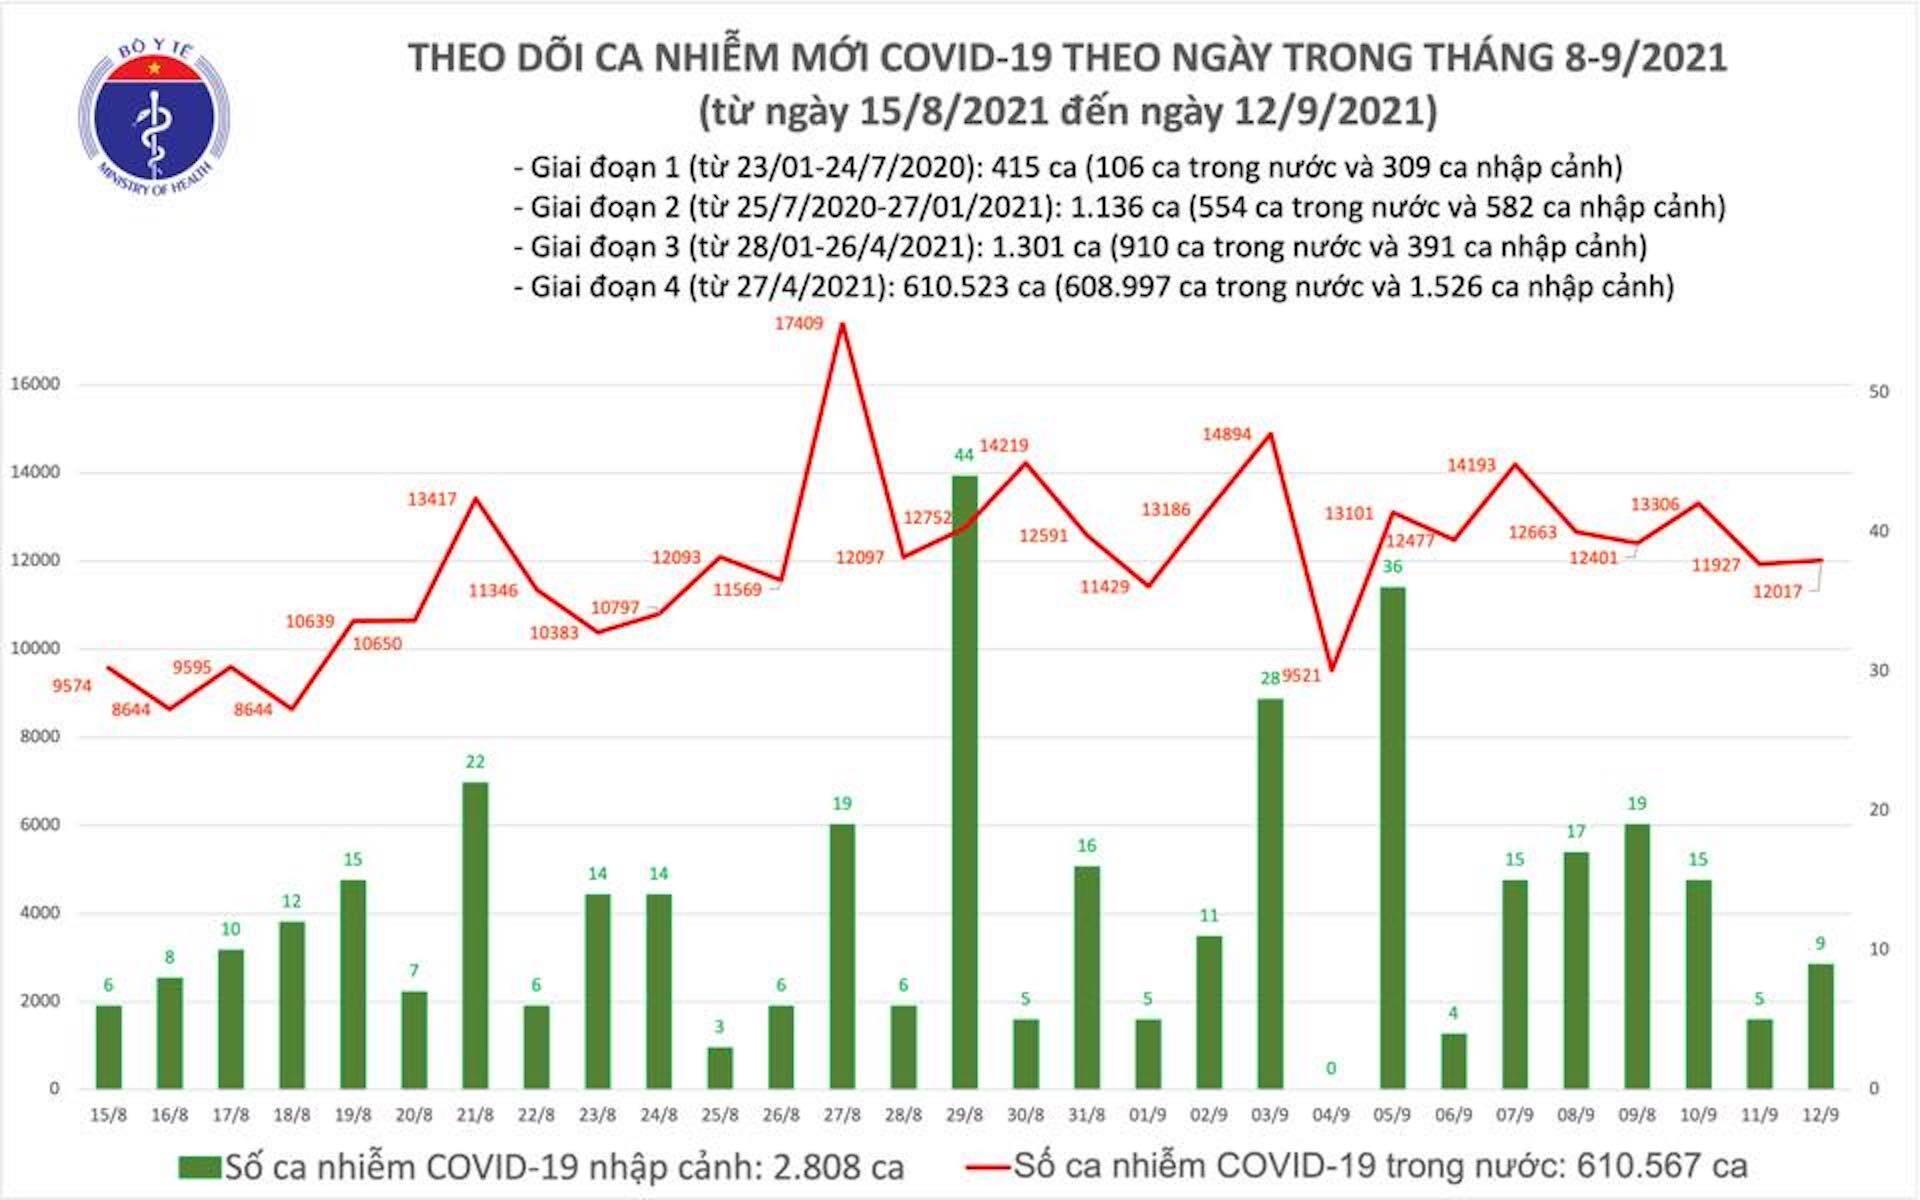 Thêm 11.527 ca COVID-19 mới, TP.HCM giảm hơn 1.000 ca - 1